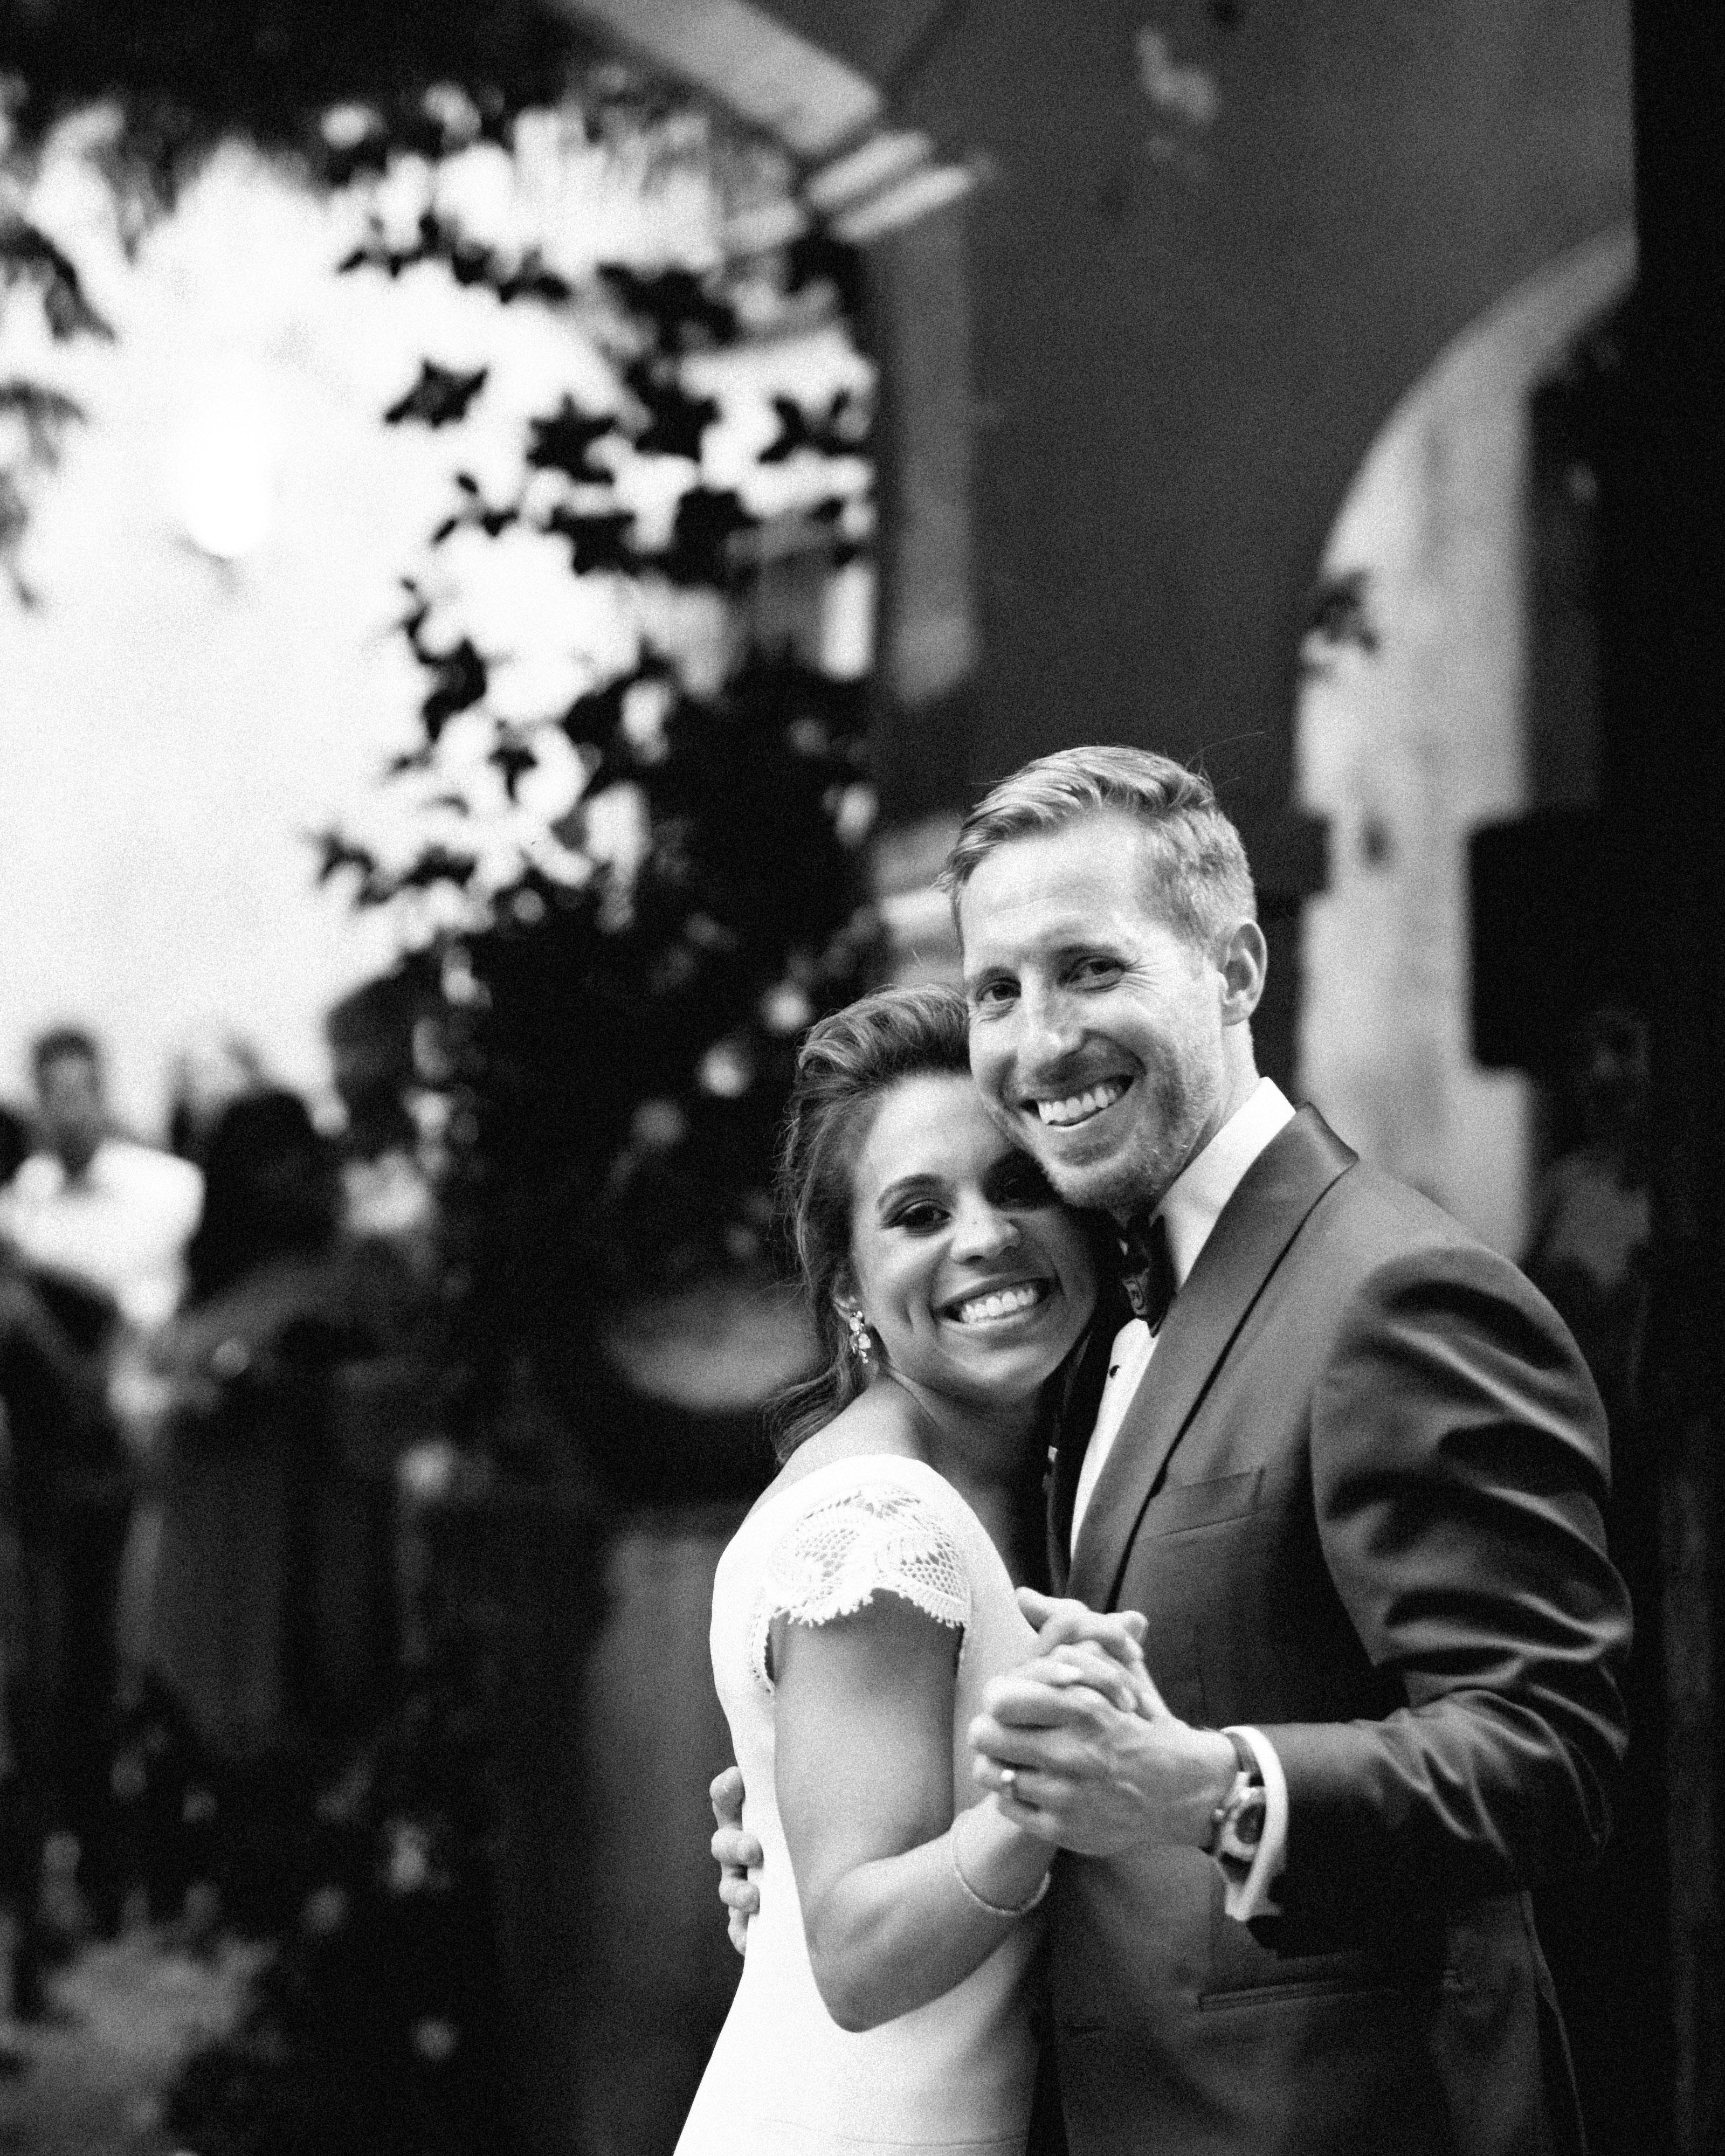 wedding couple dance black and white image